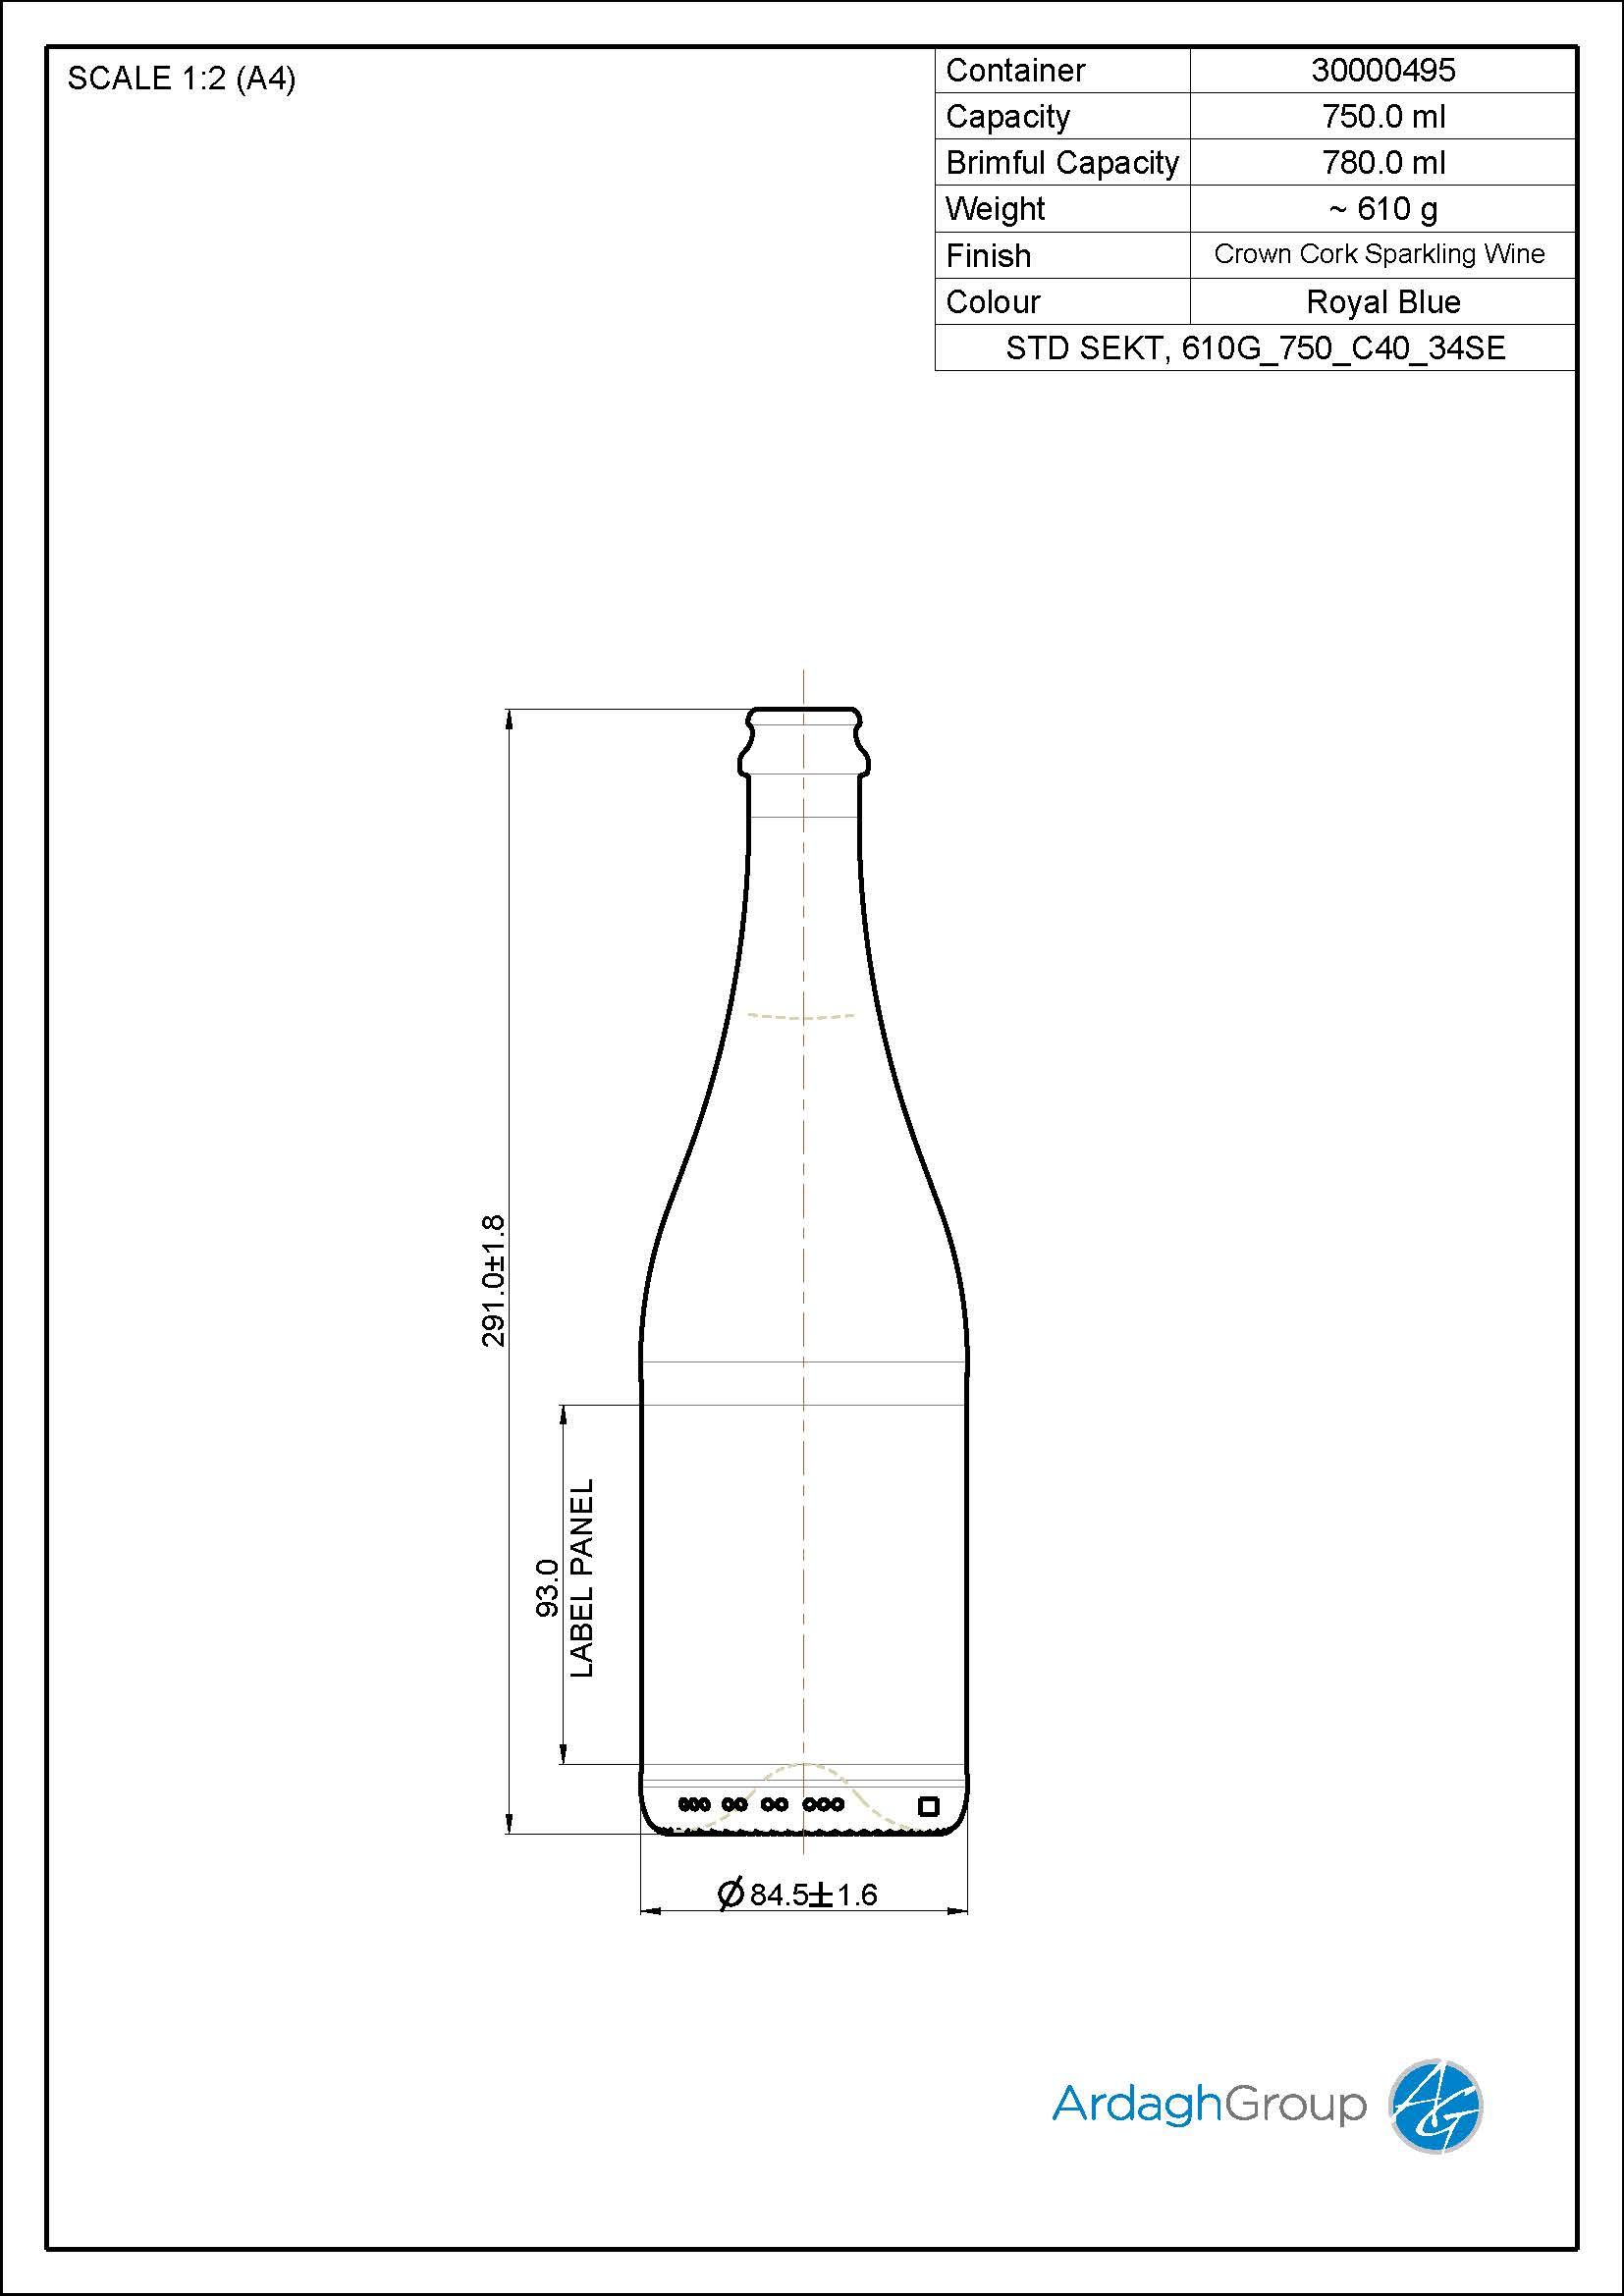 Sektflasche 750 C40 29SE